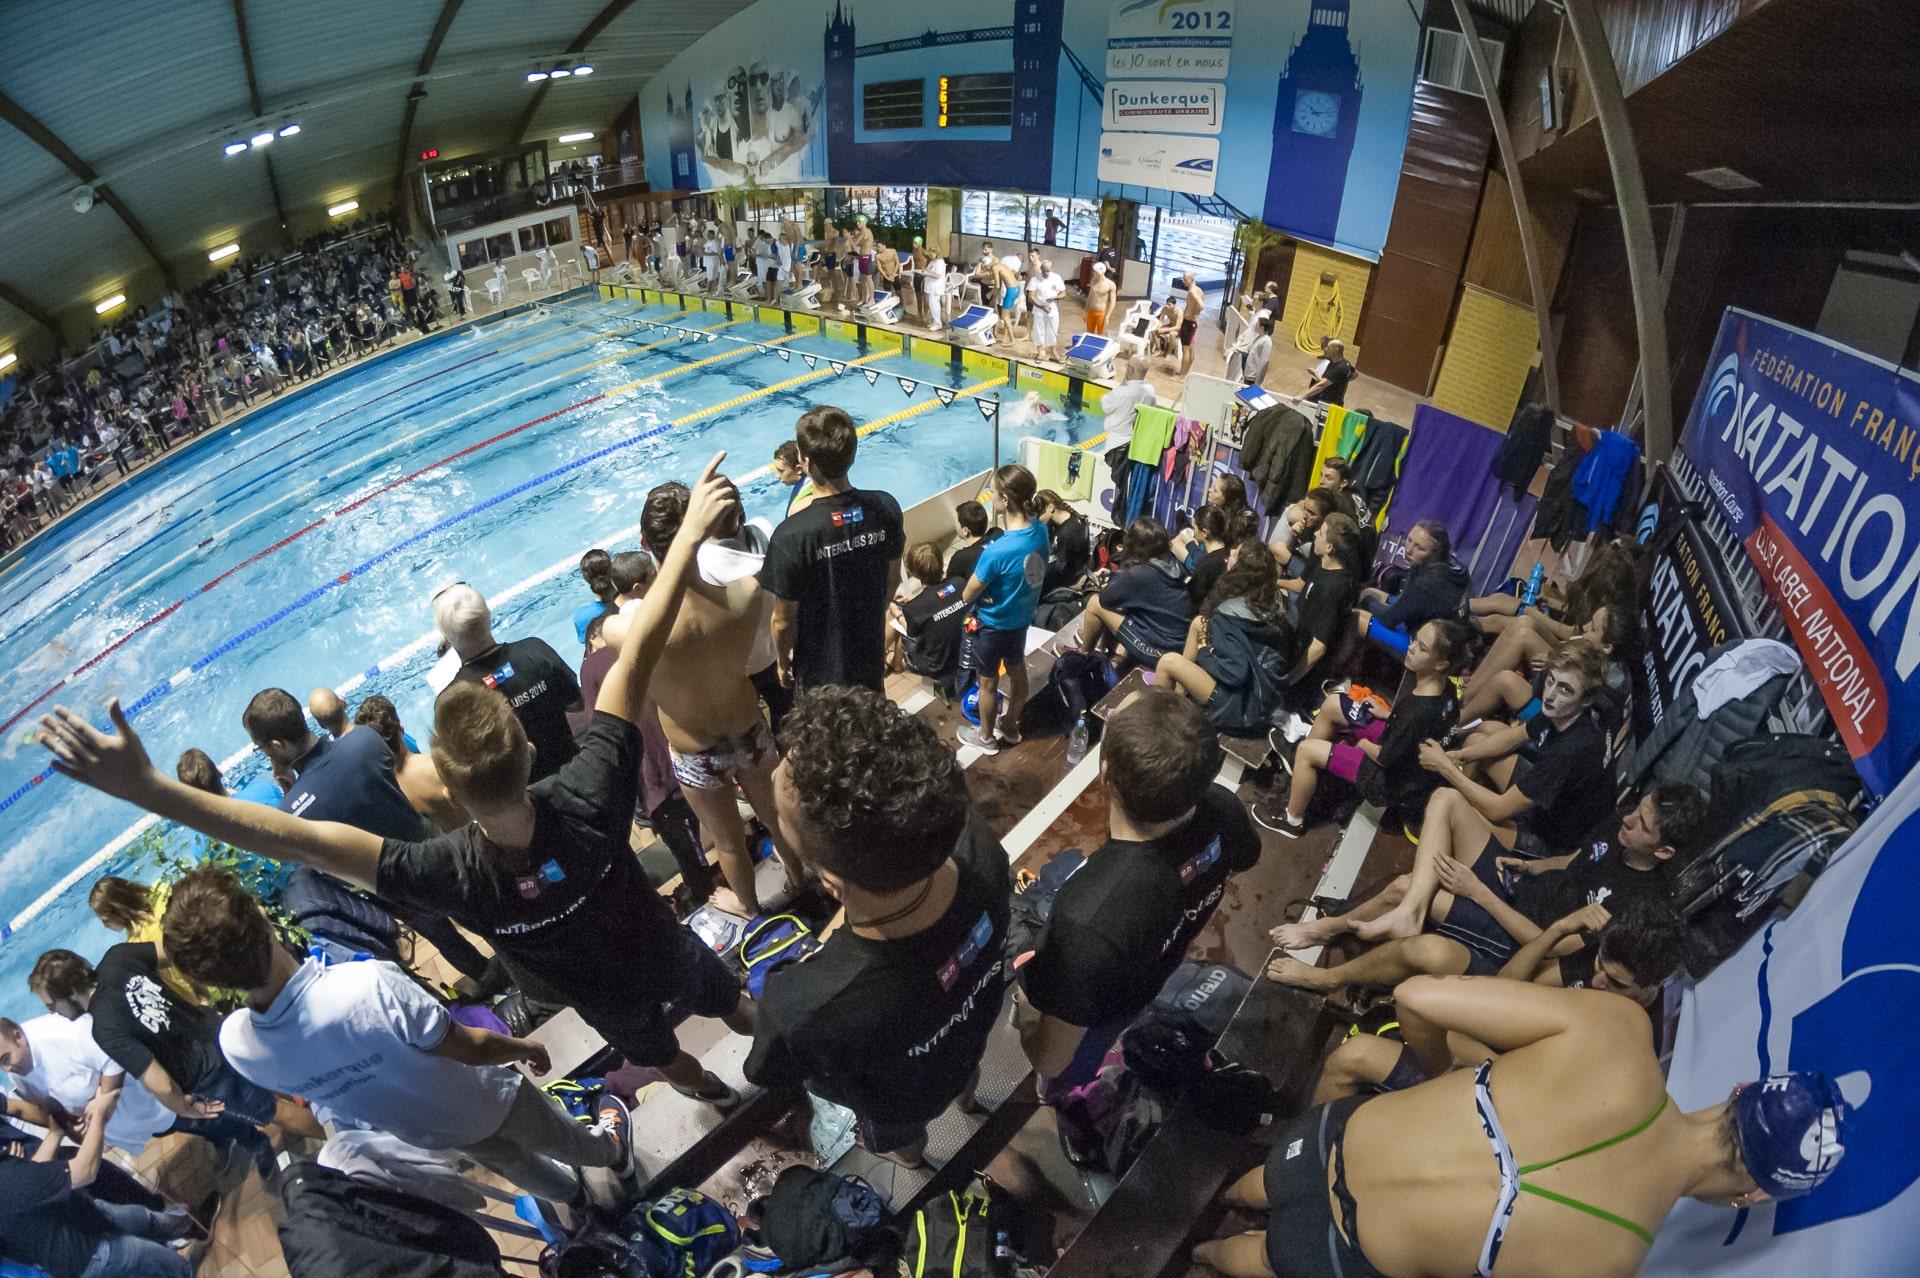 2016-11-06-DN Dunkerque Natation-230-min